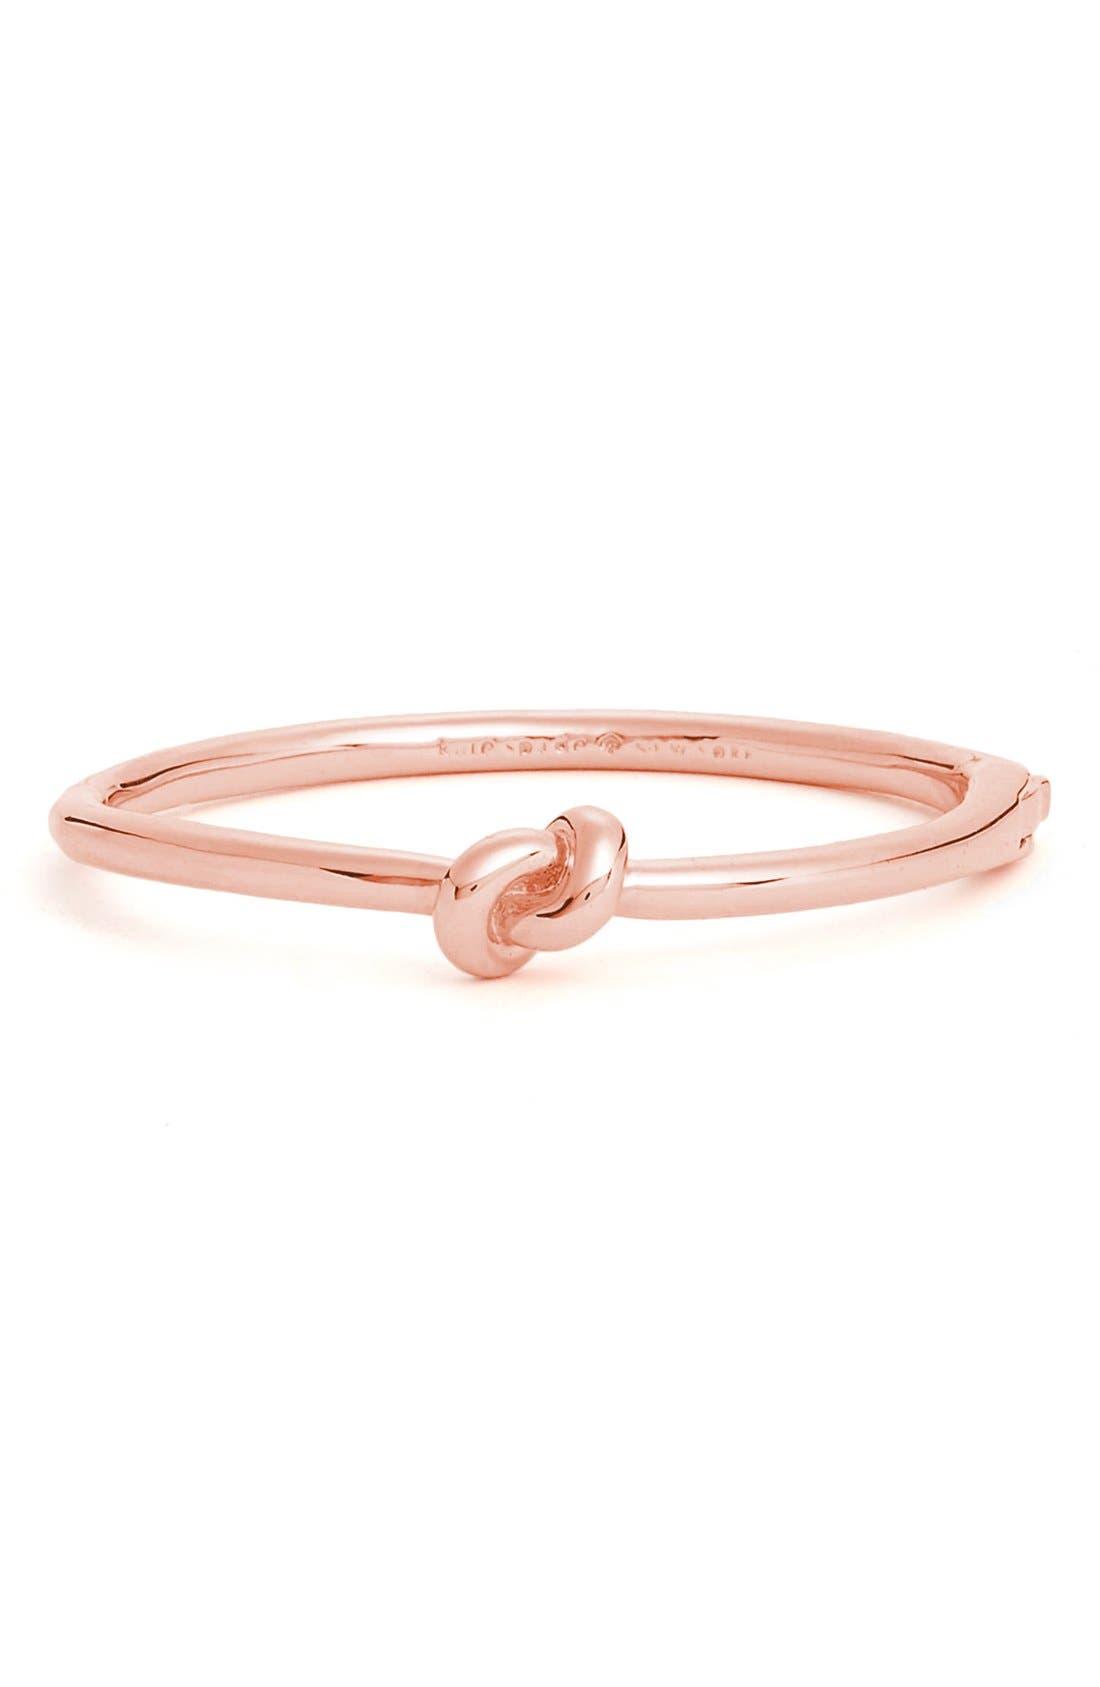 'sailors knot' bangle,                         Main,                         color, Rose Gold